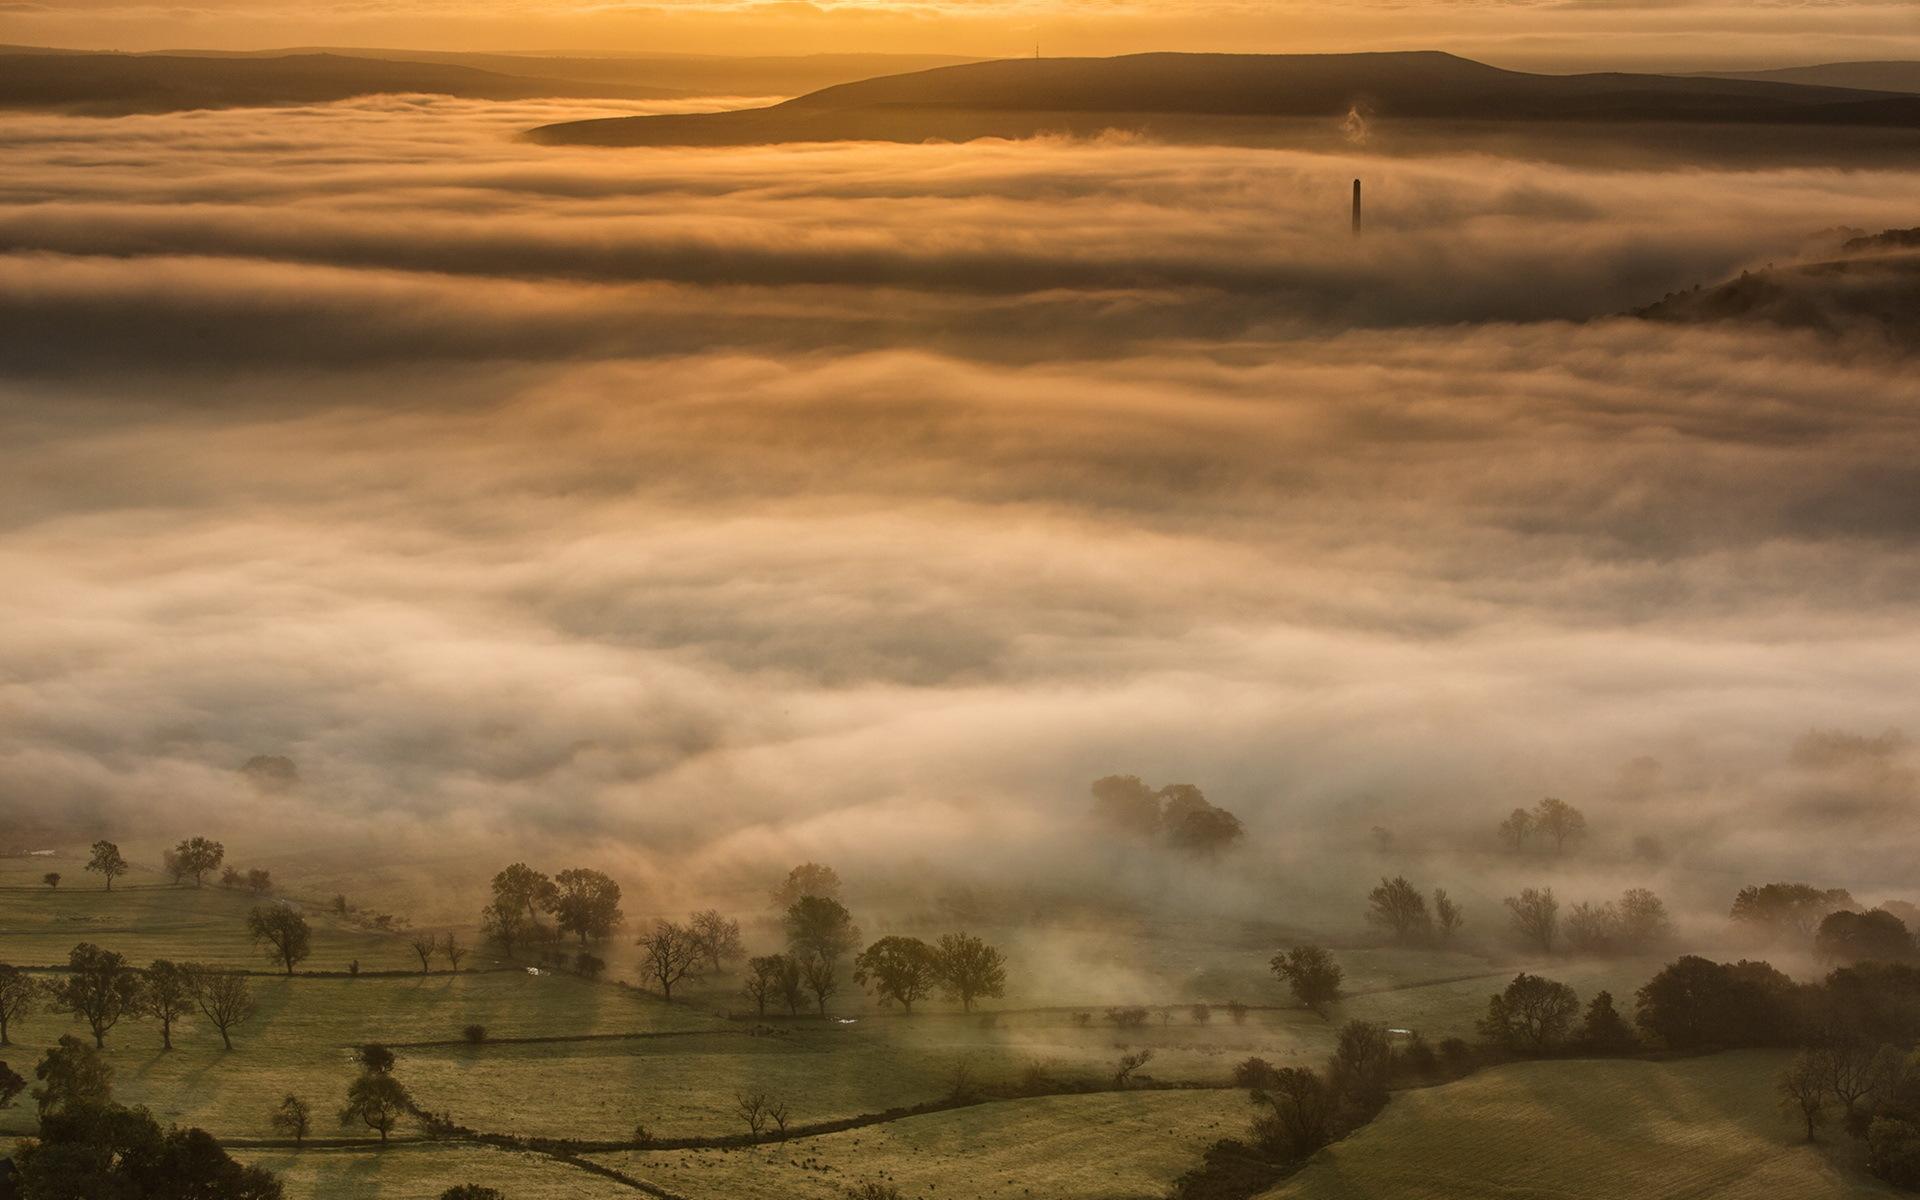 misty fog landscape wallpapers - photo #17